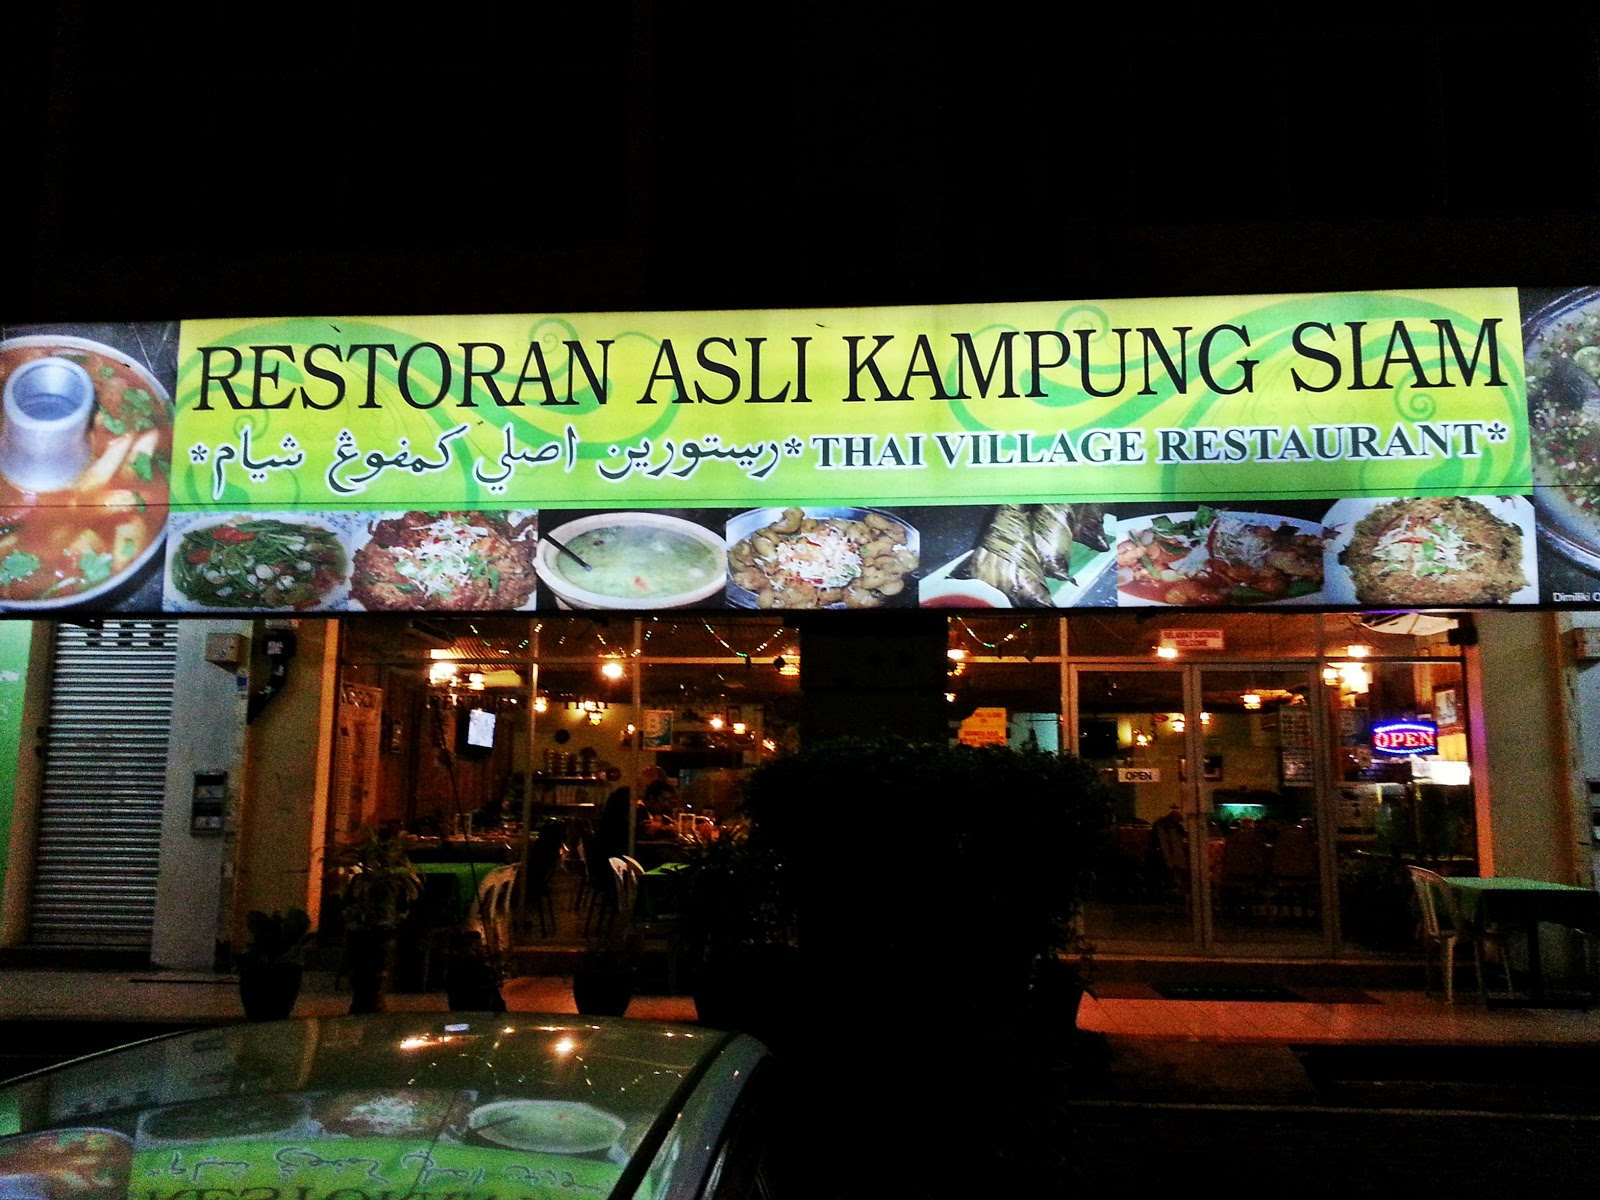 Venoth S Culinary Adventures Thai Village Restaurant Shah Alam Selangor